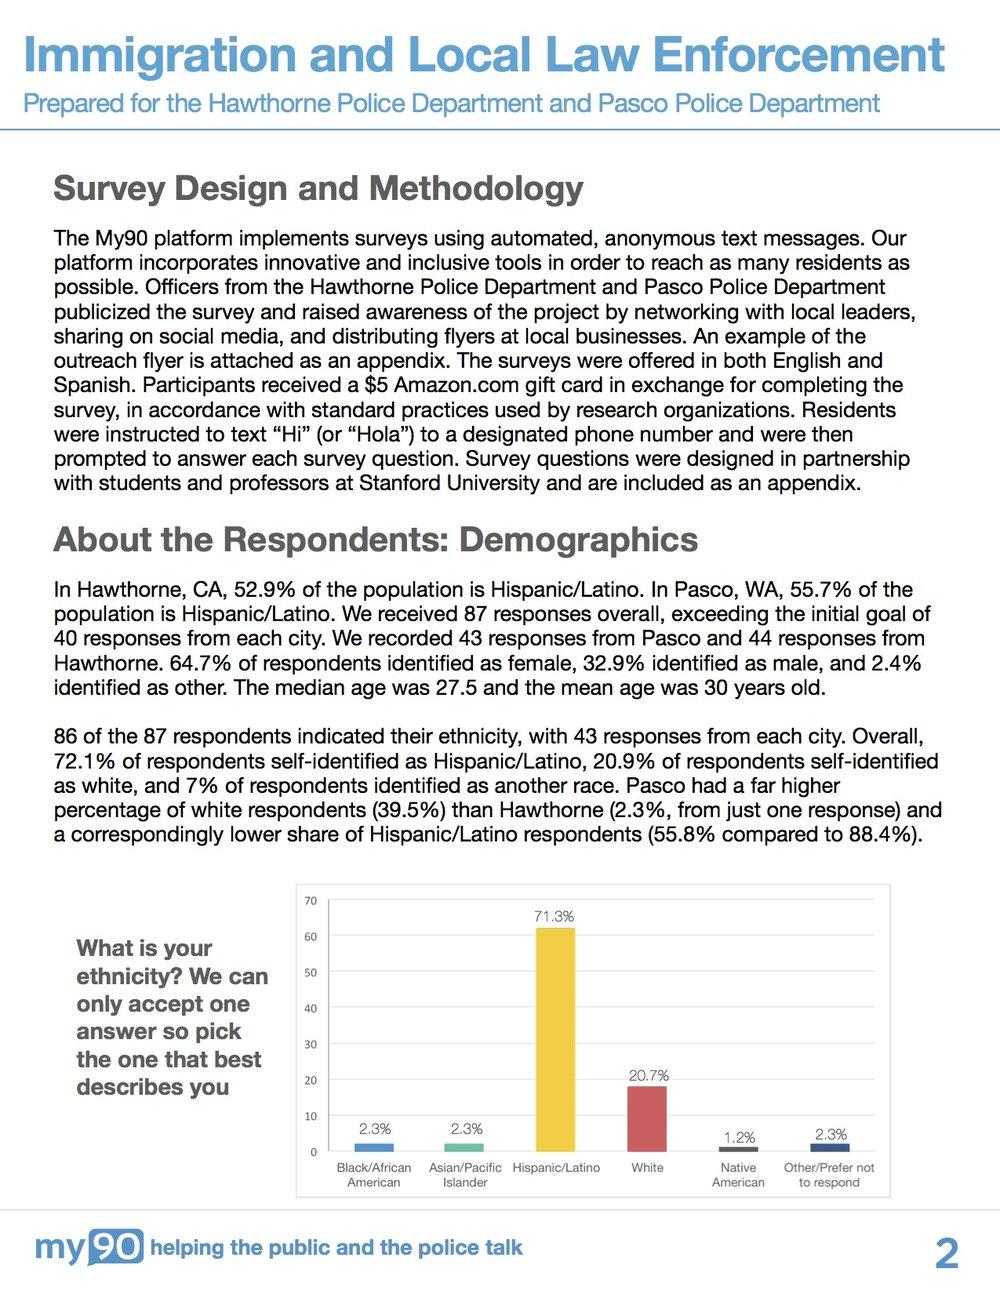 Immigration Report 2.jpg